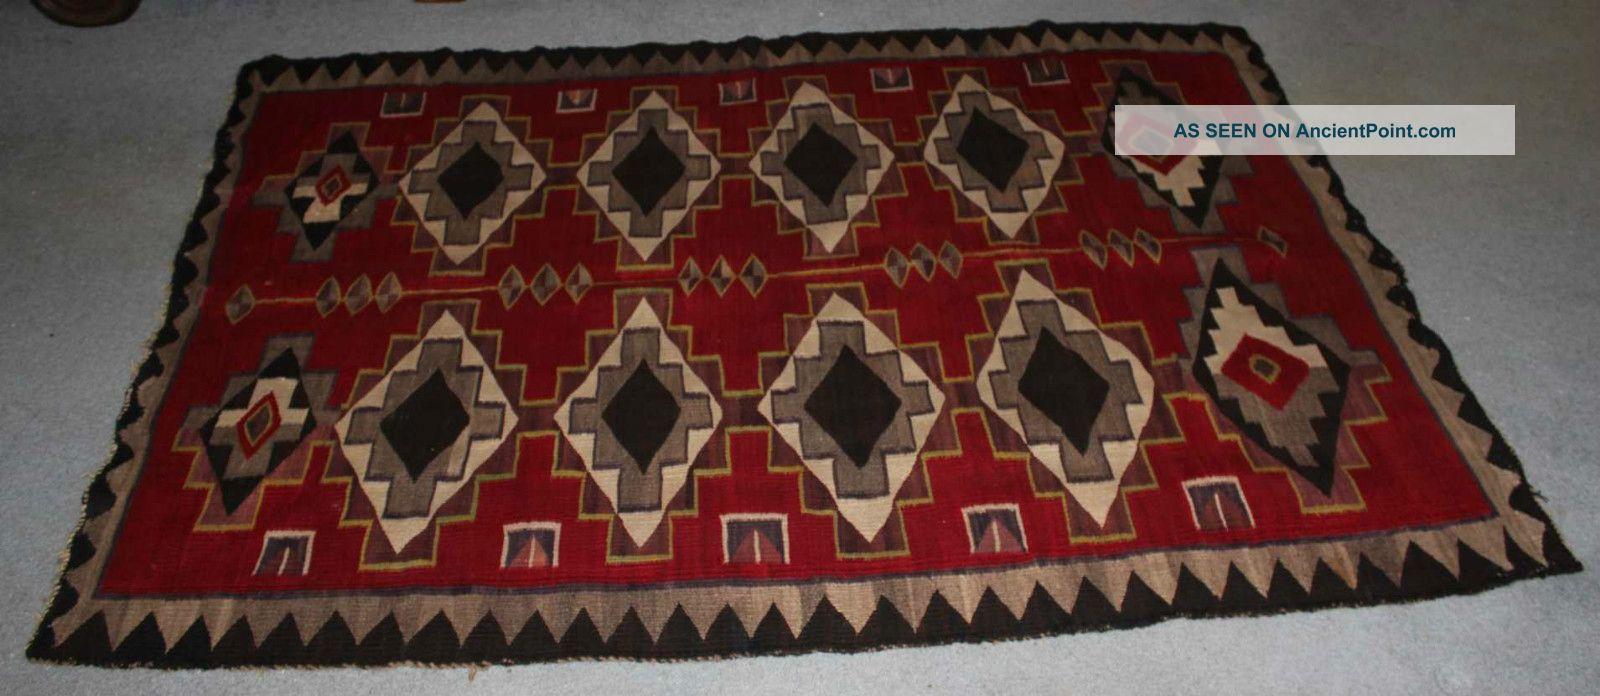 Antique Navajo Indian Trading Rug Circa 1900 Native American photo